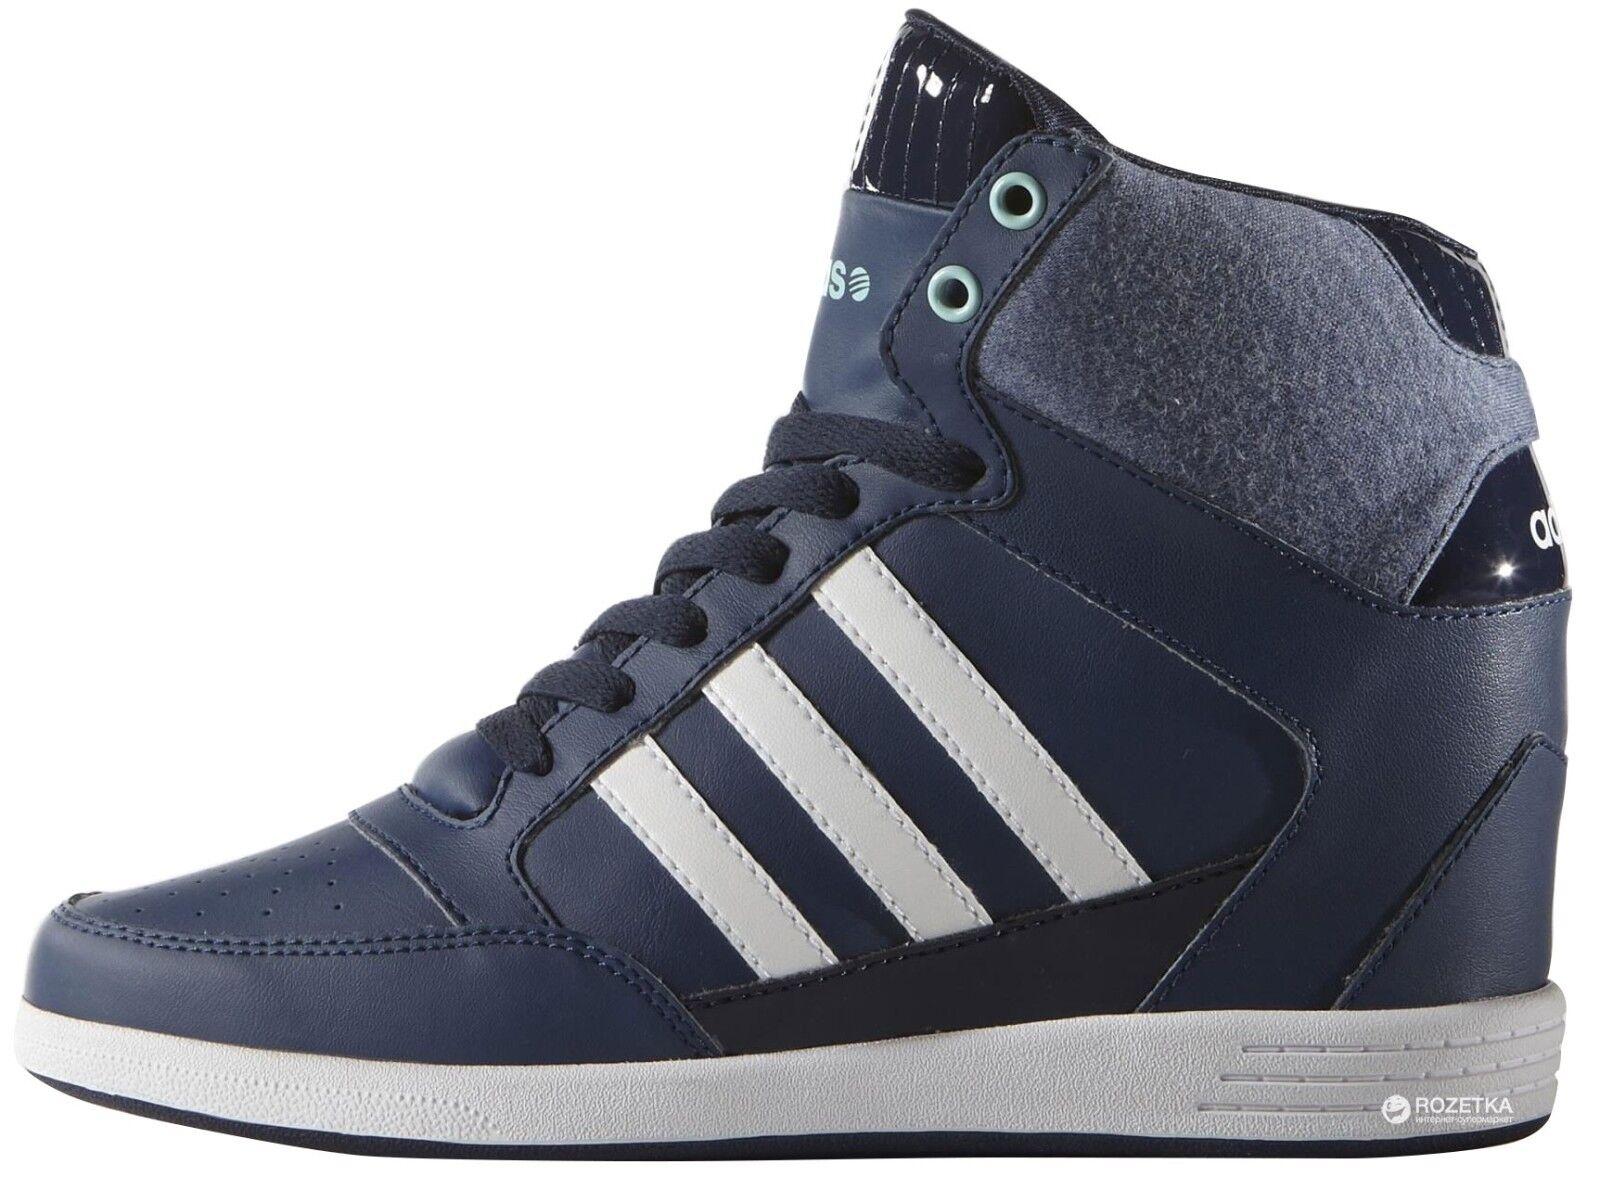 e07473d2380e Adidas NEO Super Wedge Women s Sports Sneakers F98649 Hi Tops bluee  Trainers Rare